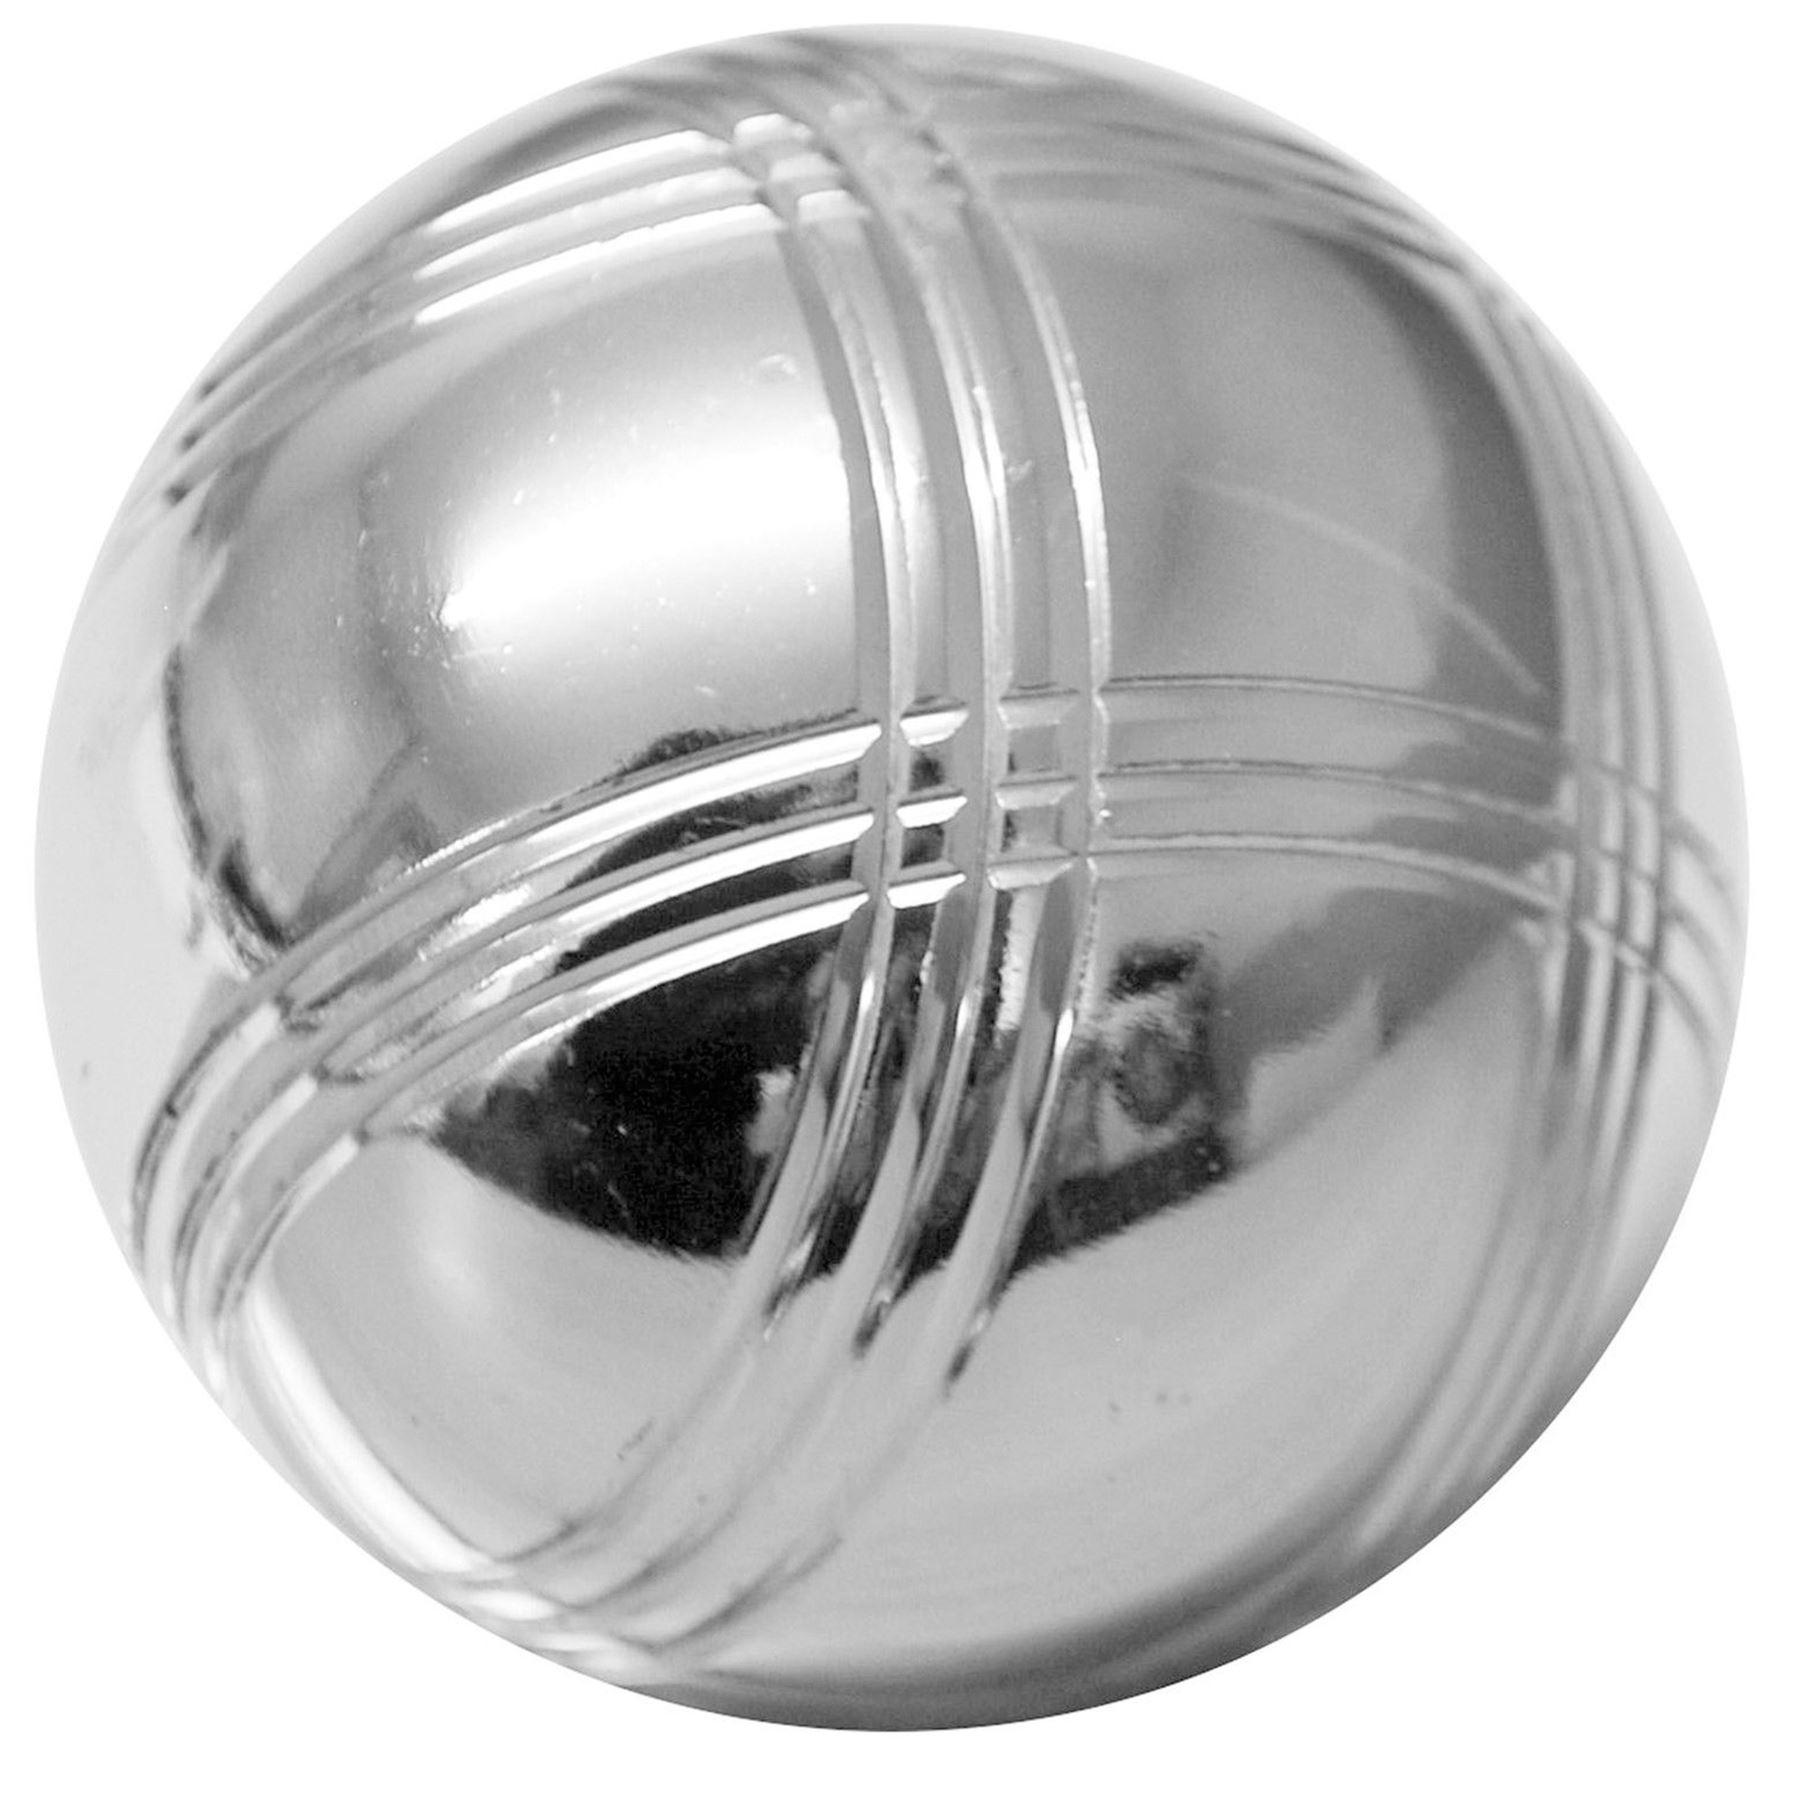 steel french boules 8 petanque metal balls complete garden game set outdoor new ebay. Black Bedroom Furniture Sets. Home Design Ideas